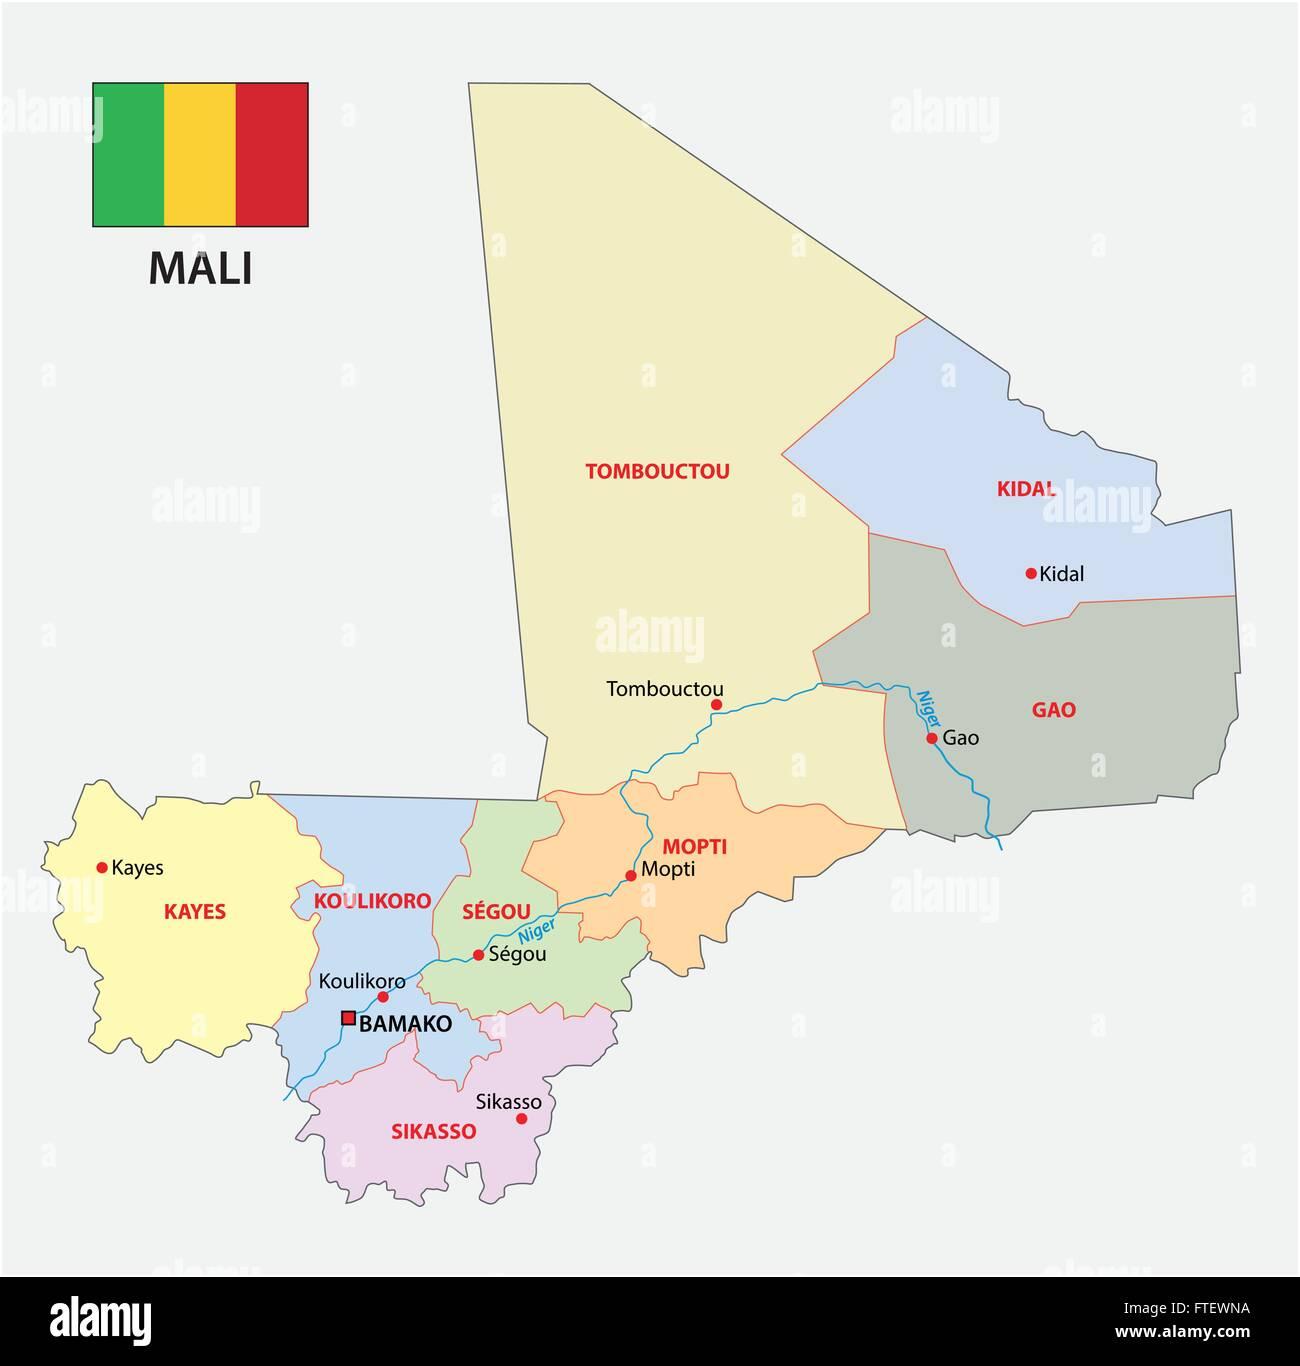 Mali Map Stock Photos Mali Map Stock Images Alamy